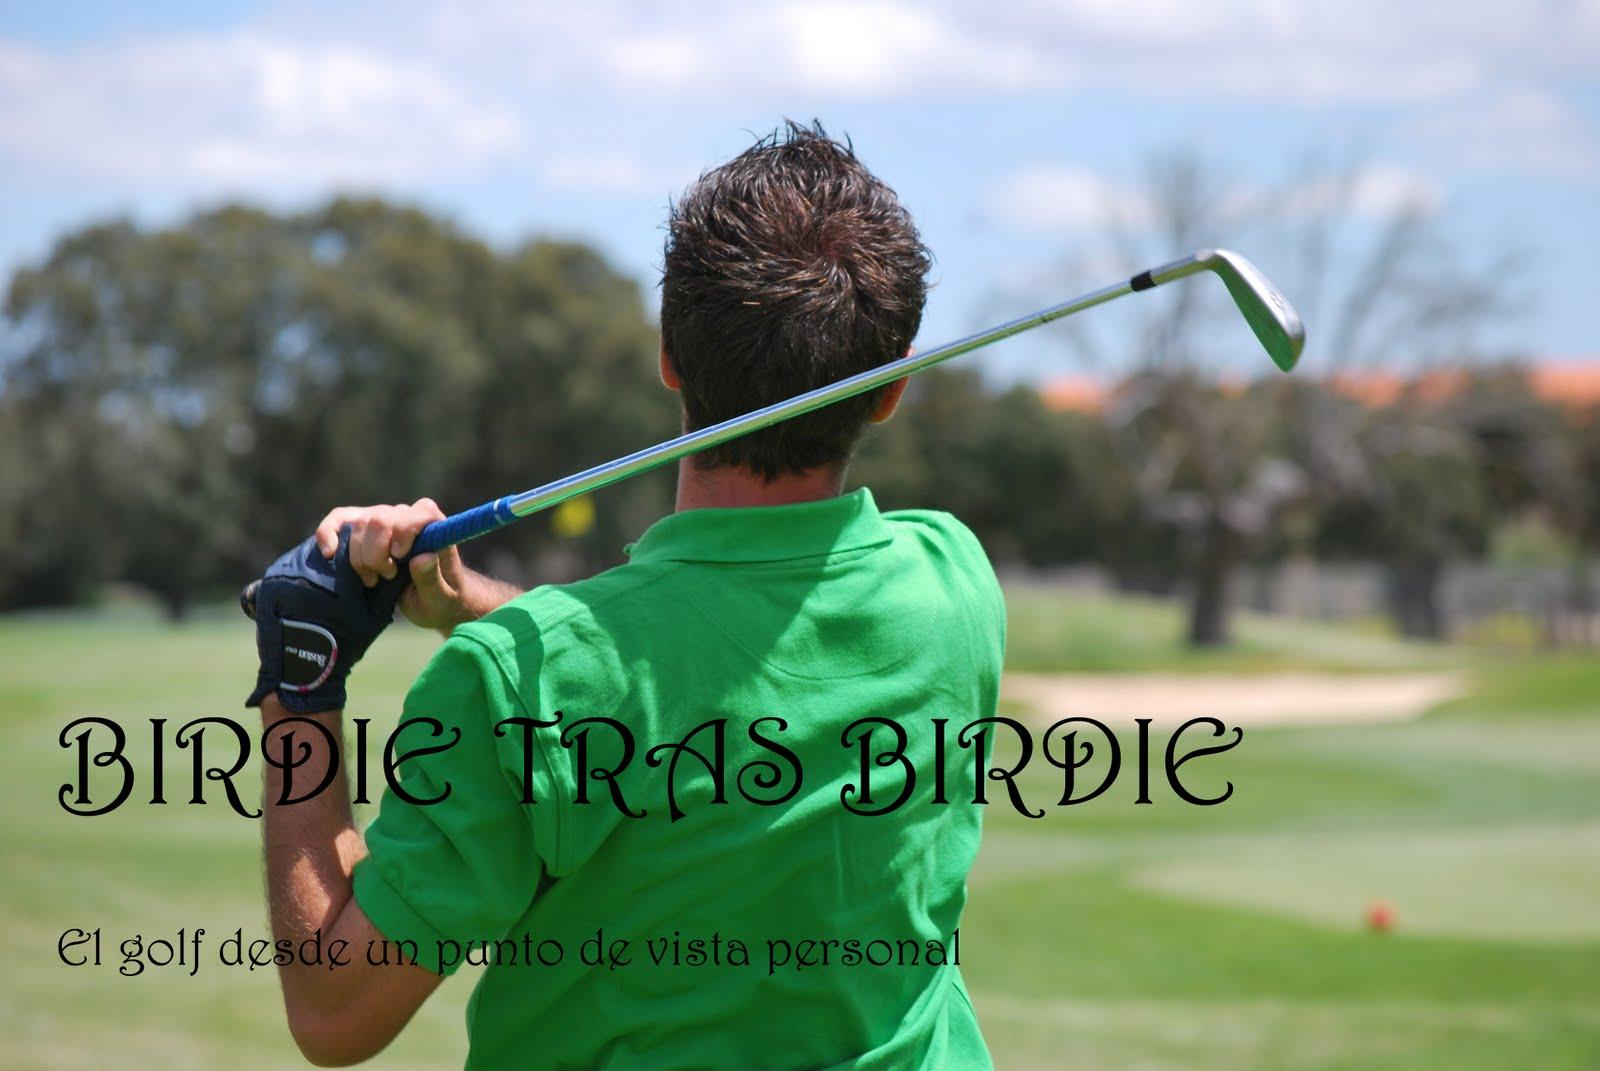 Birdie tras birdie